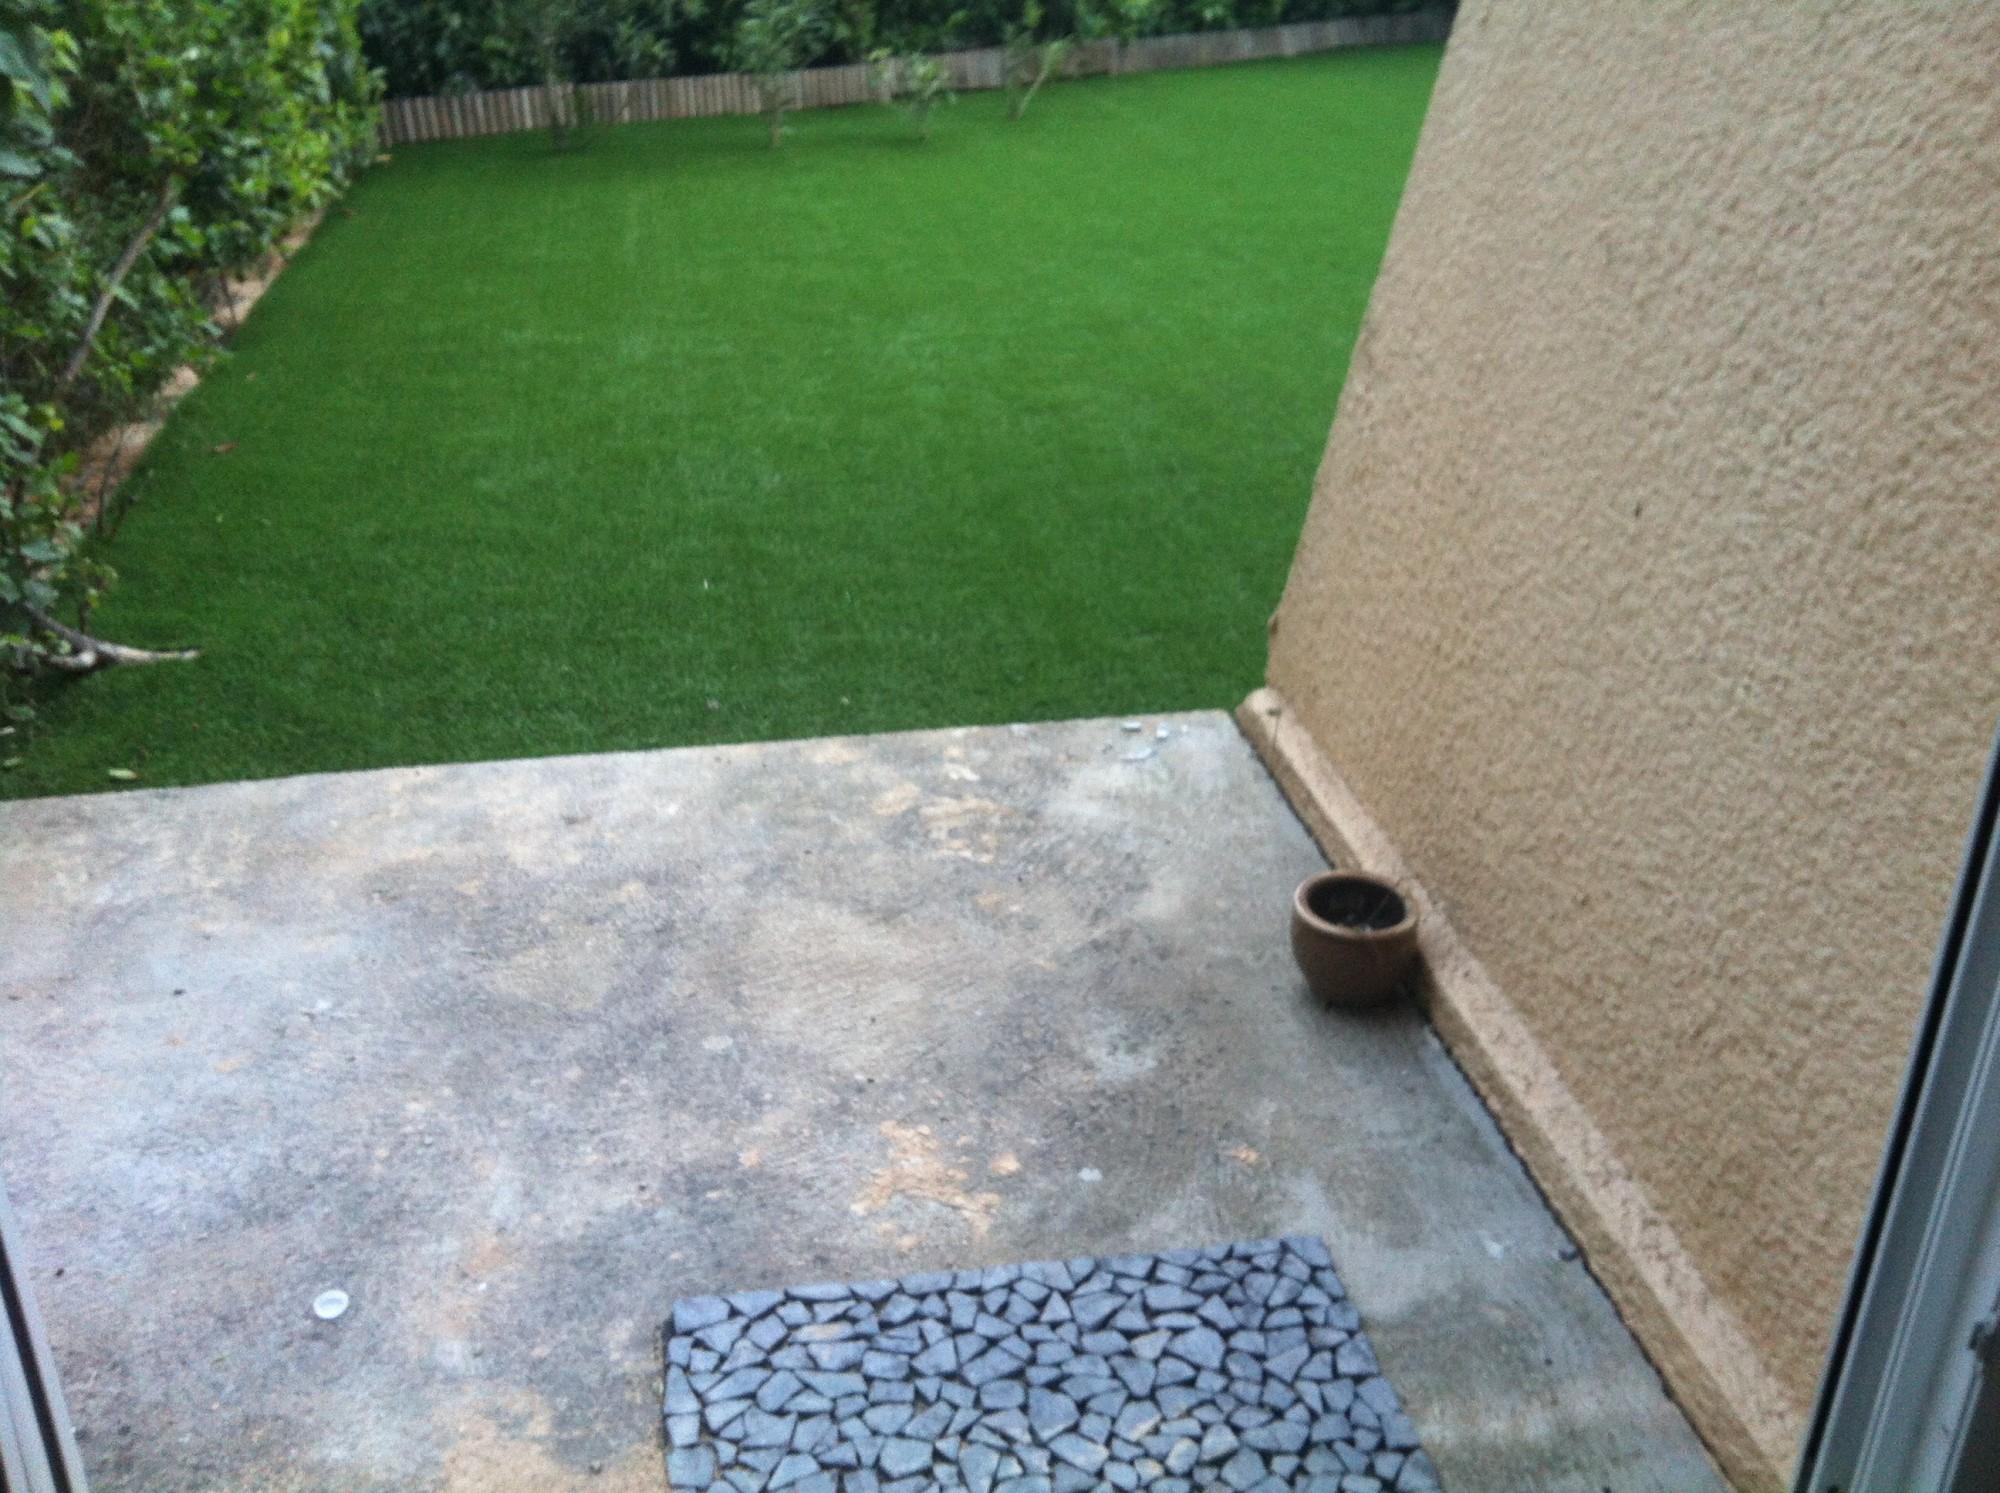 installation d 39 un petit jardin en gazon synth tique aix en provence la pose gazon synth tique. Black Bedroom Furniture Sets. Home Design Ideas